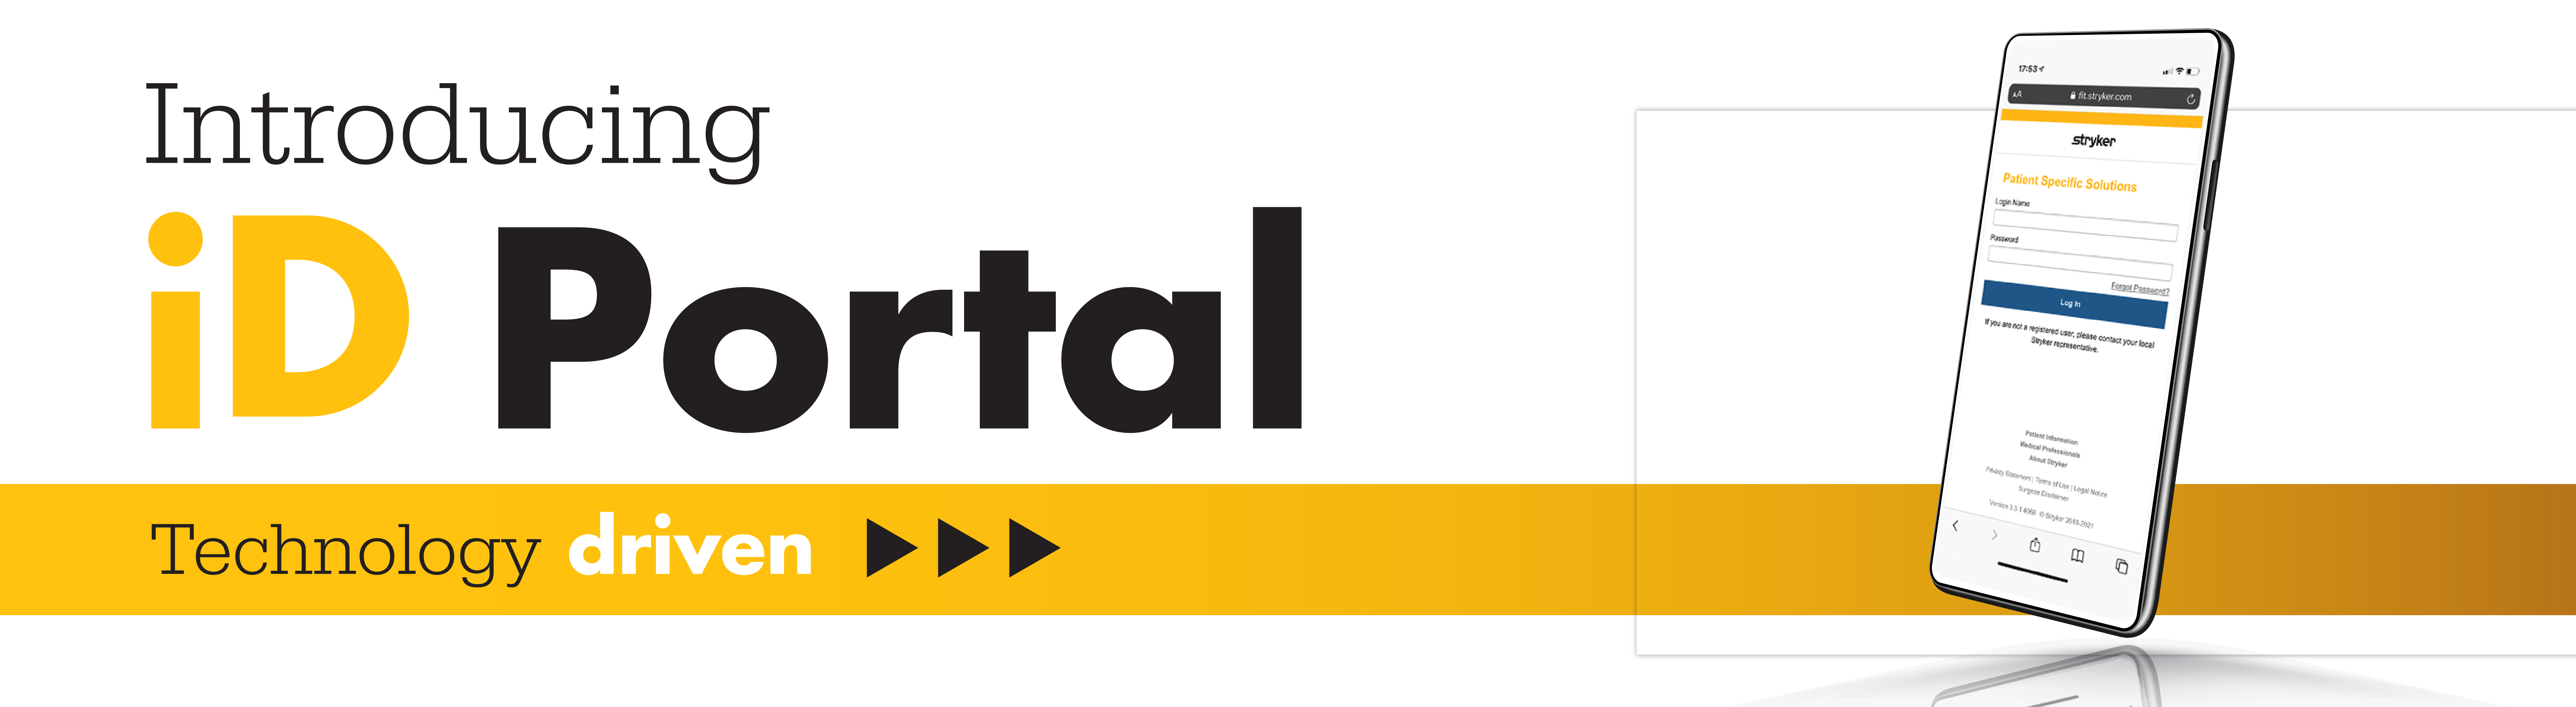 iD Portal Banner